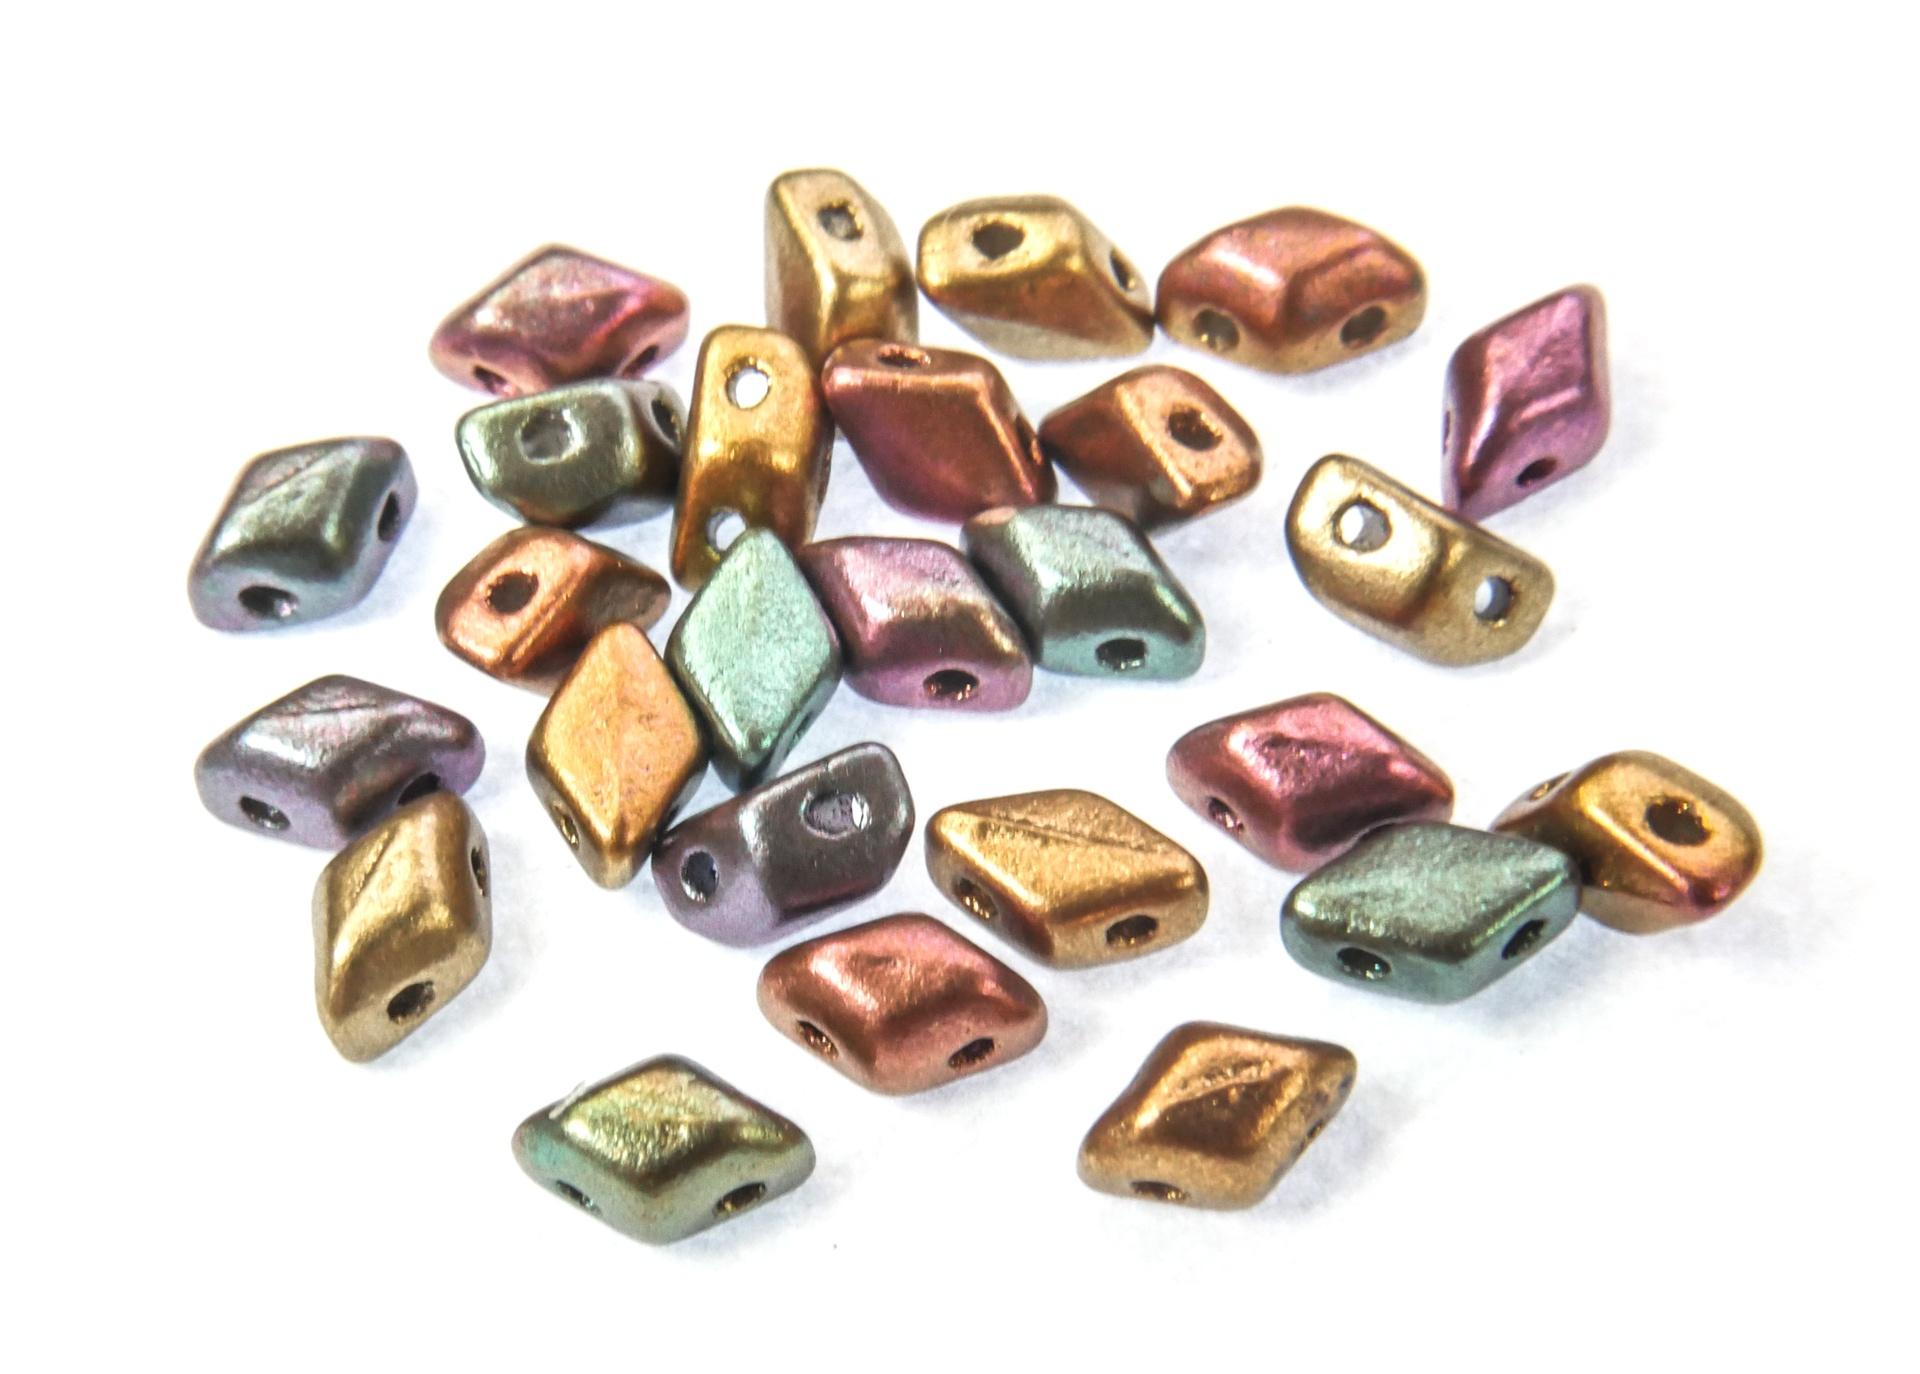 Czech Pressed Glass Beads / All Matubo Beads / Mini GemDuo Beads by Matubo